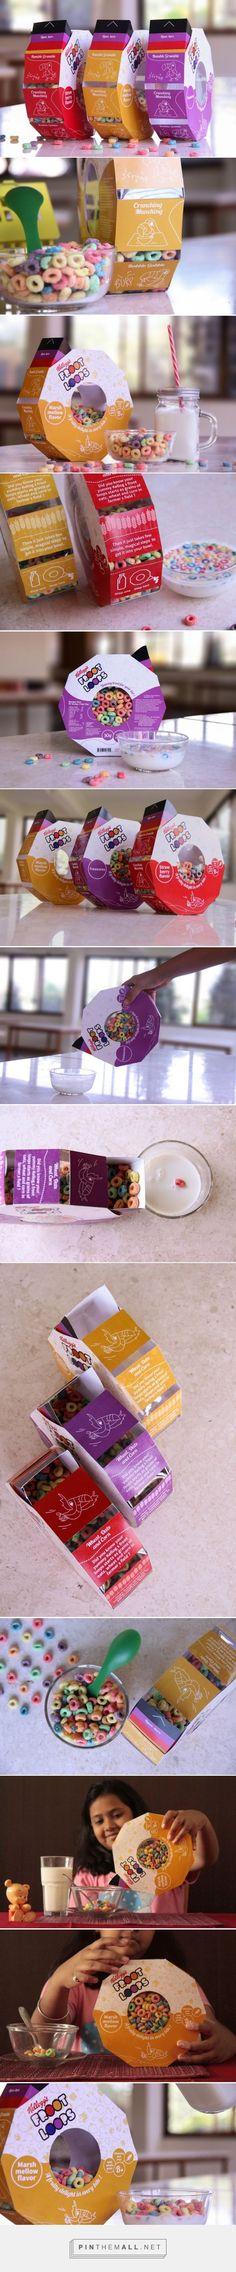 Frootloops cereal packaging designed by student Prachi Deshingkar, Shikha Kanakia (India) - http://www.packagingoftheworld.com/2016/03/frootloops-student-project.html